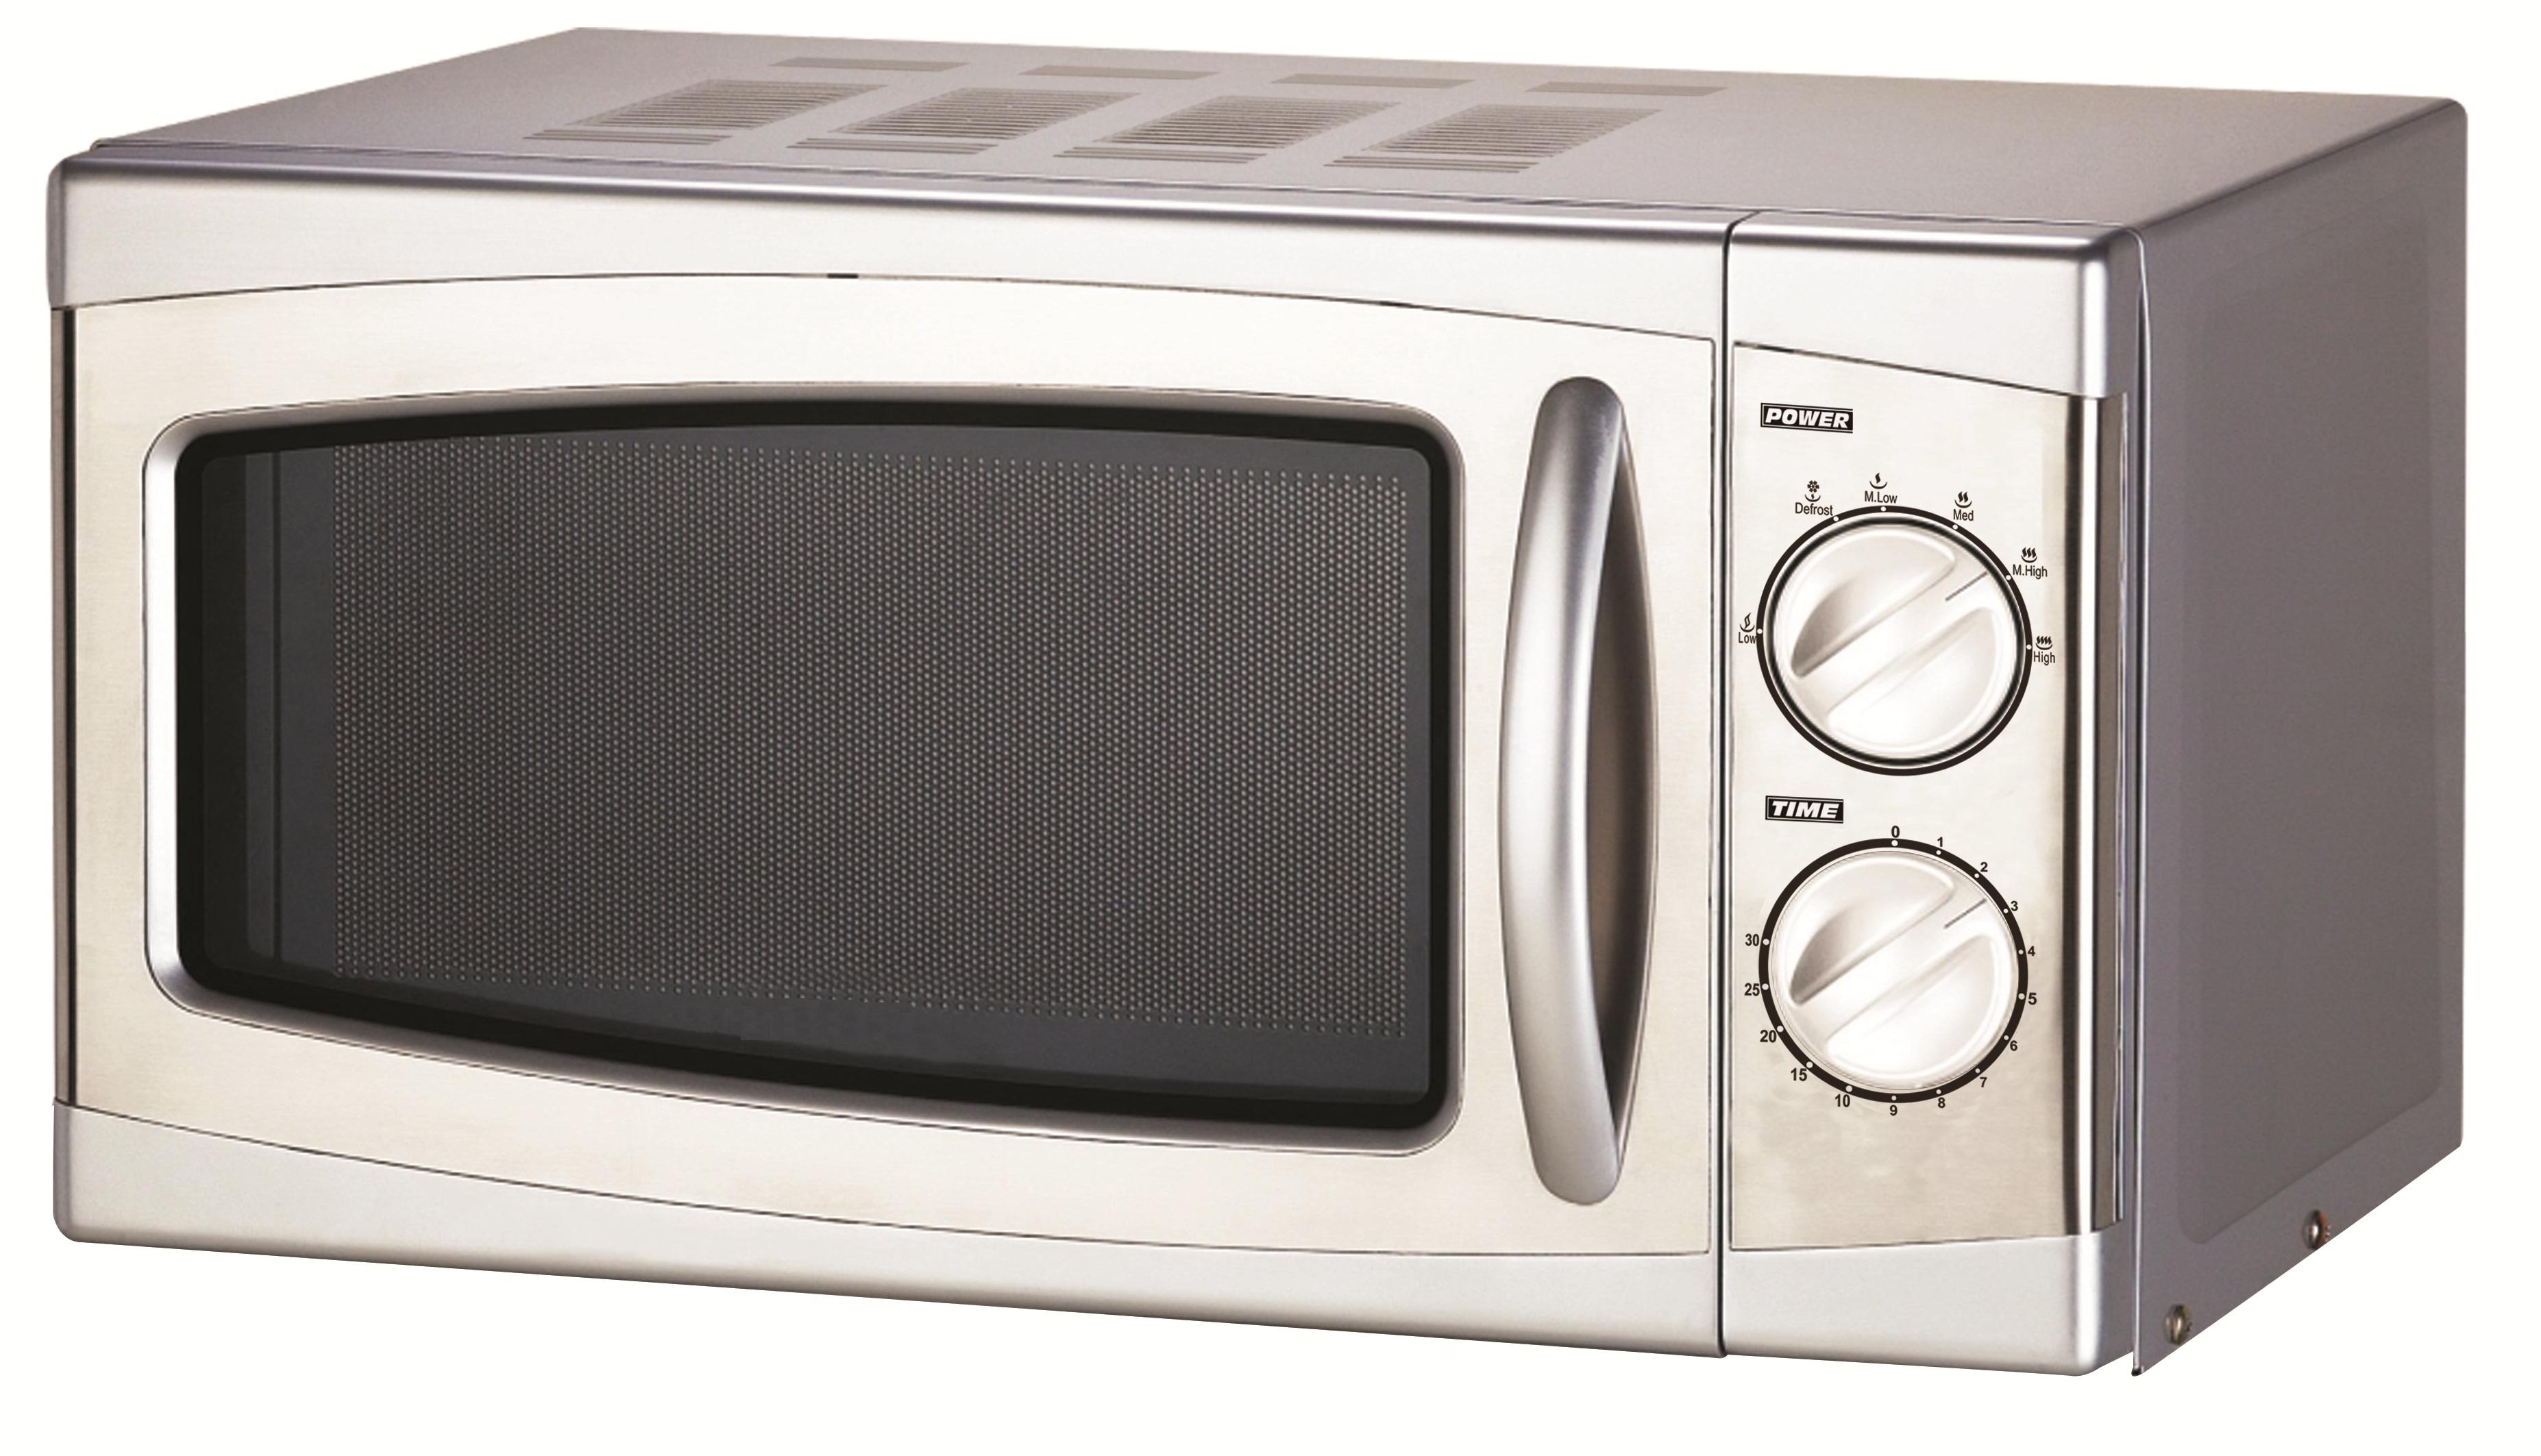 Микроволновая печь GASTRORAG WD700N20, Silver